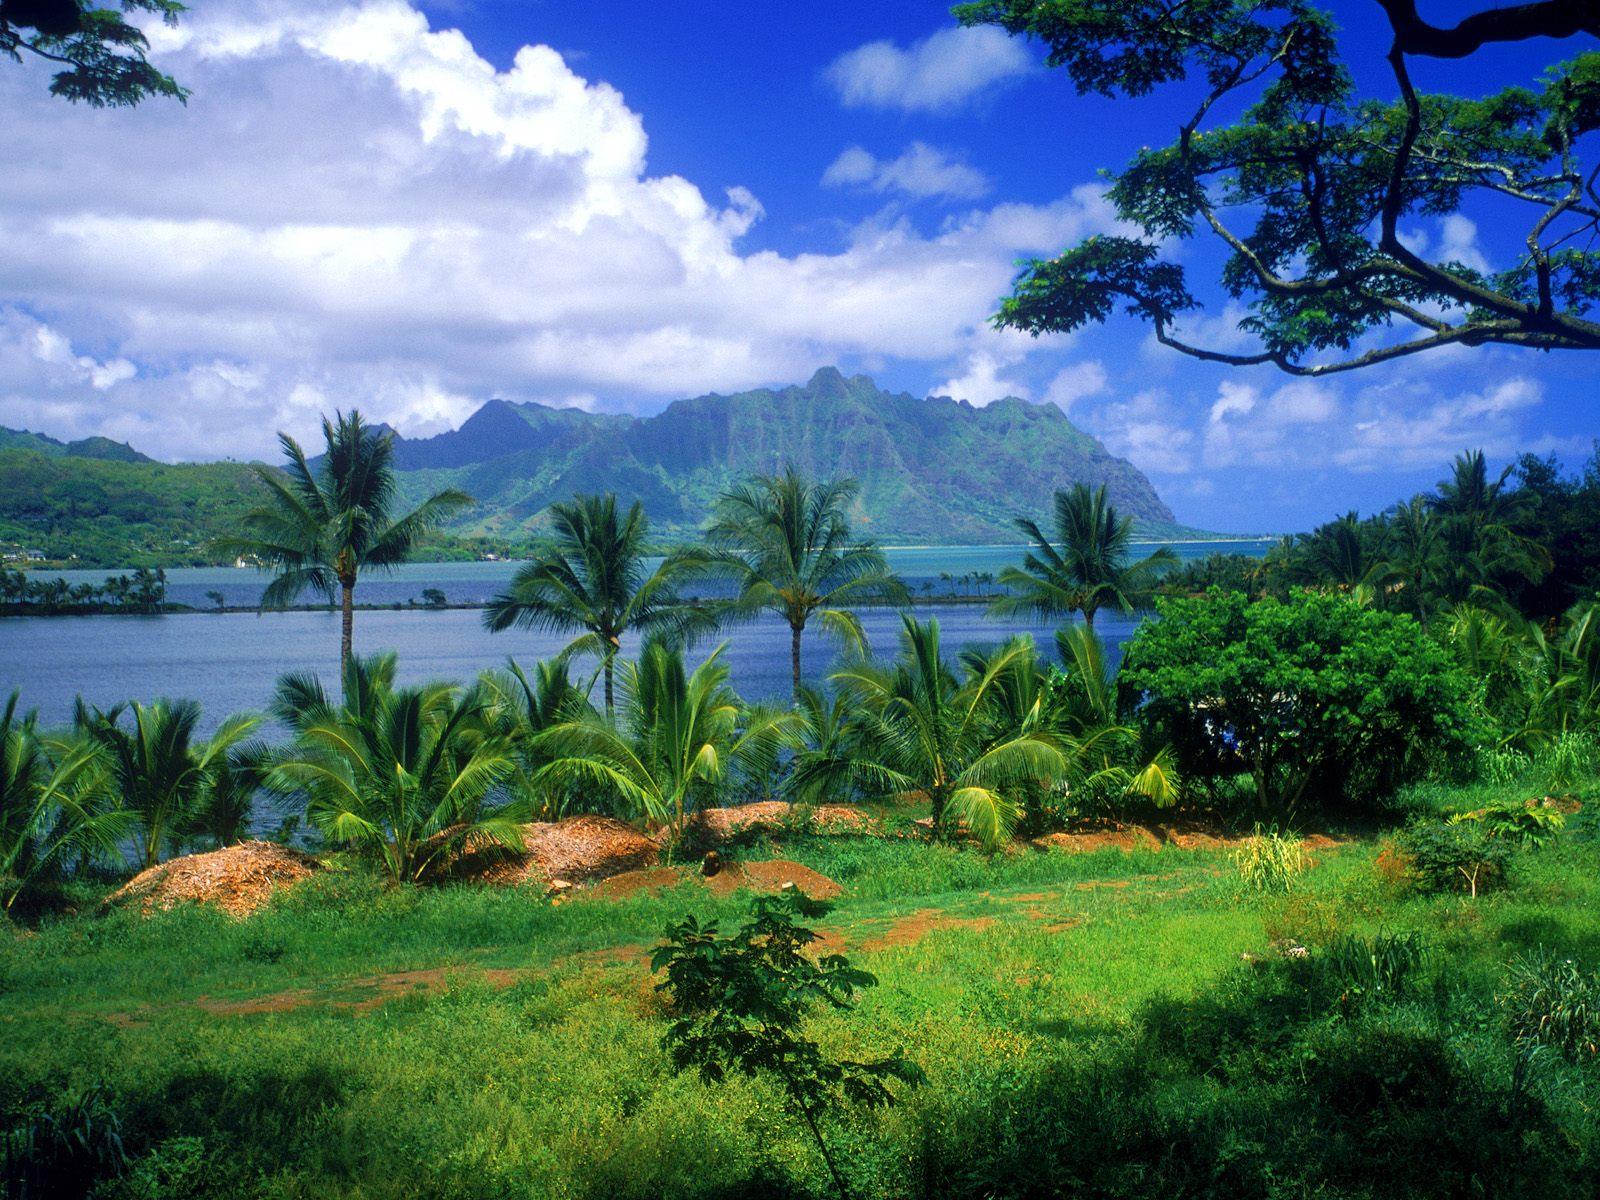 http://4.bp.blogspot.com/_e45GK4i1E8M/TRW999AkvUI/AAAAAAAACV8/QsD9X2TdTJM/s1600/Kaneohe_Fish_Pond_Oahu_Hawaii.jpg